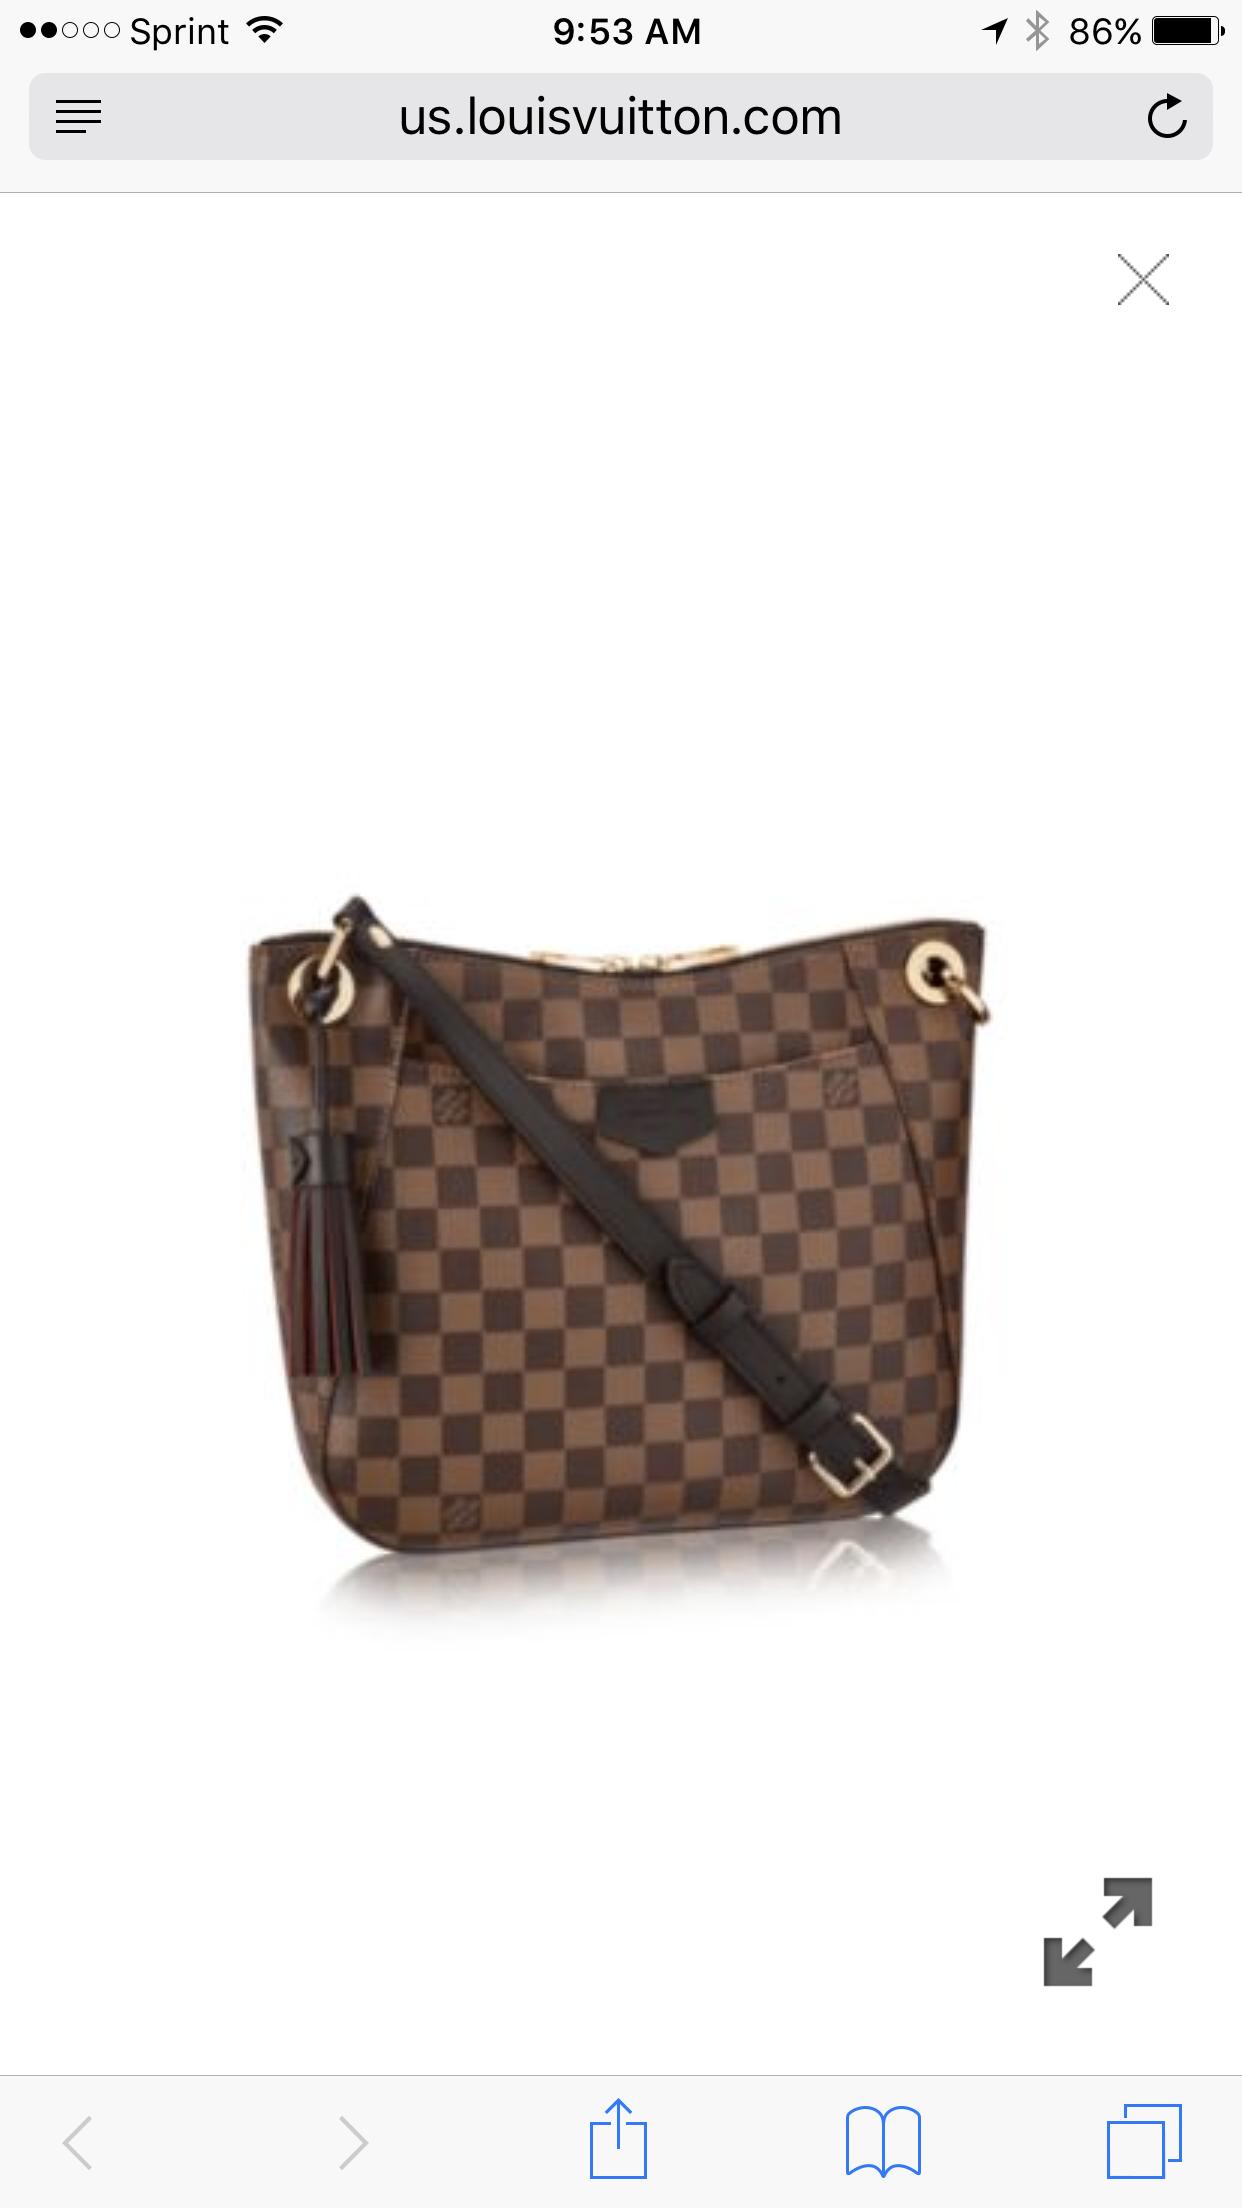 bbfee0d4eba00 Louis Vuitton South Bank Besace Winter Wear, Louis Vuitton Damier, Hand Bags,  Wallets